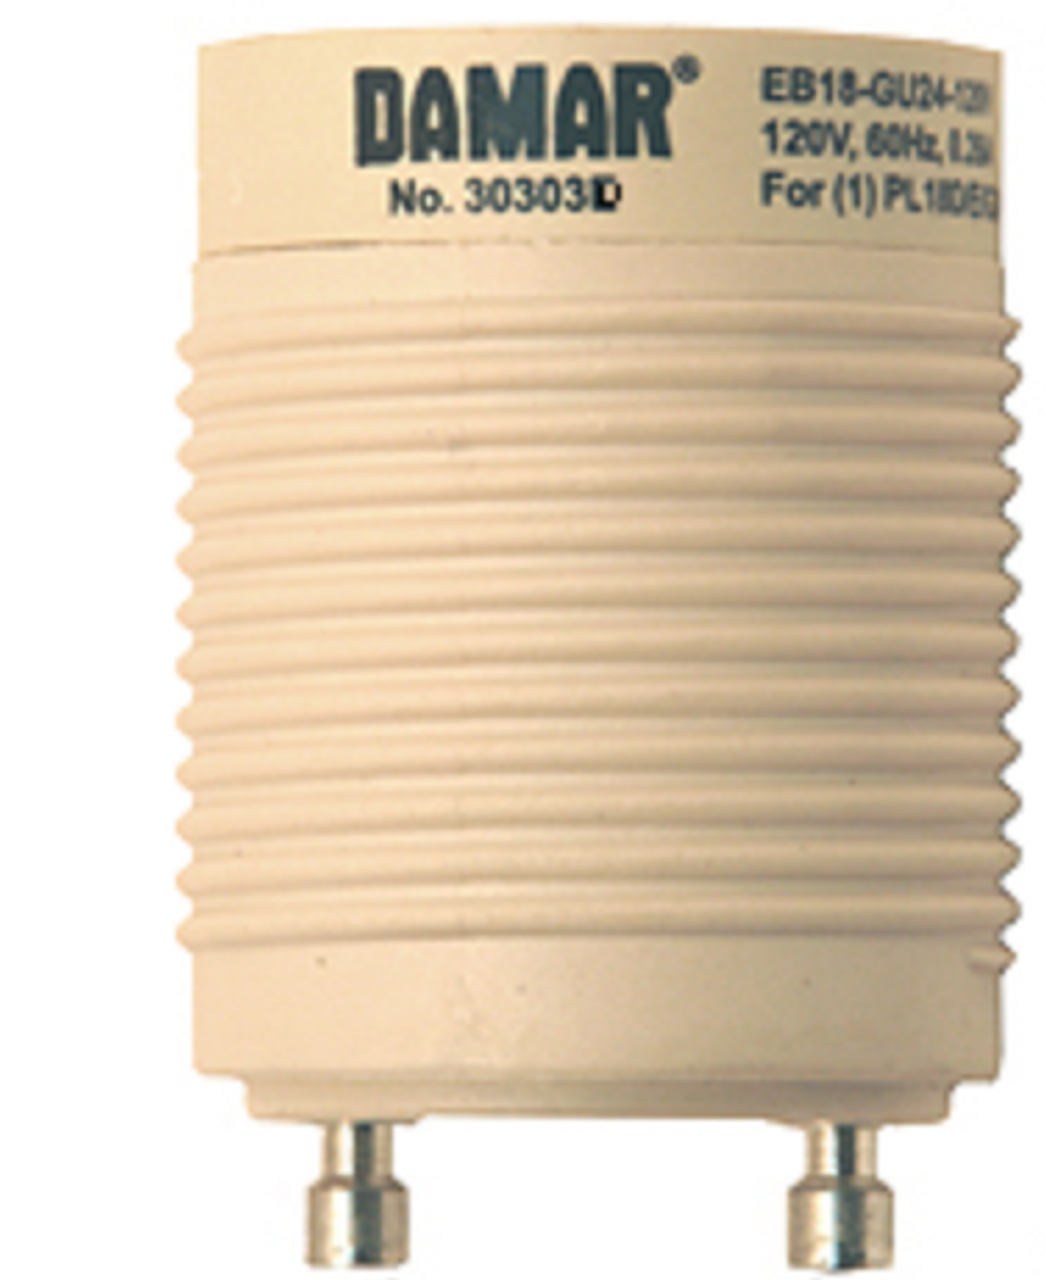 EB13-GU24-120V Damar (30303D) 13W GU24 Socket Ballast Replacement